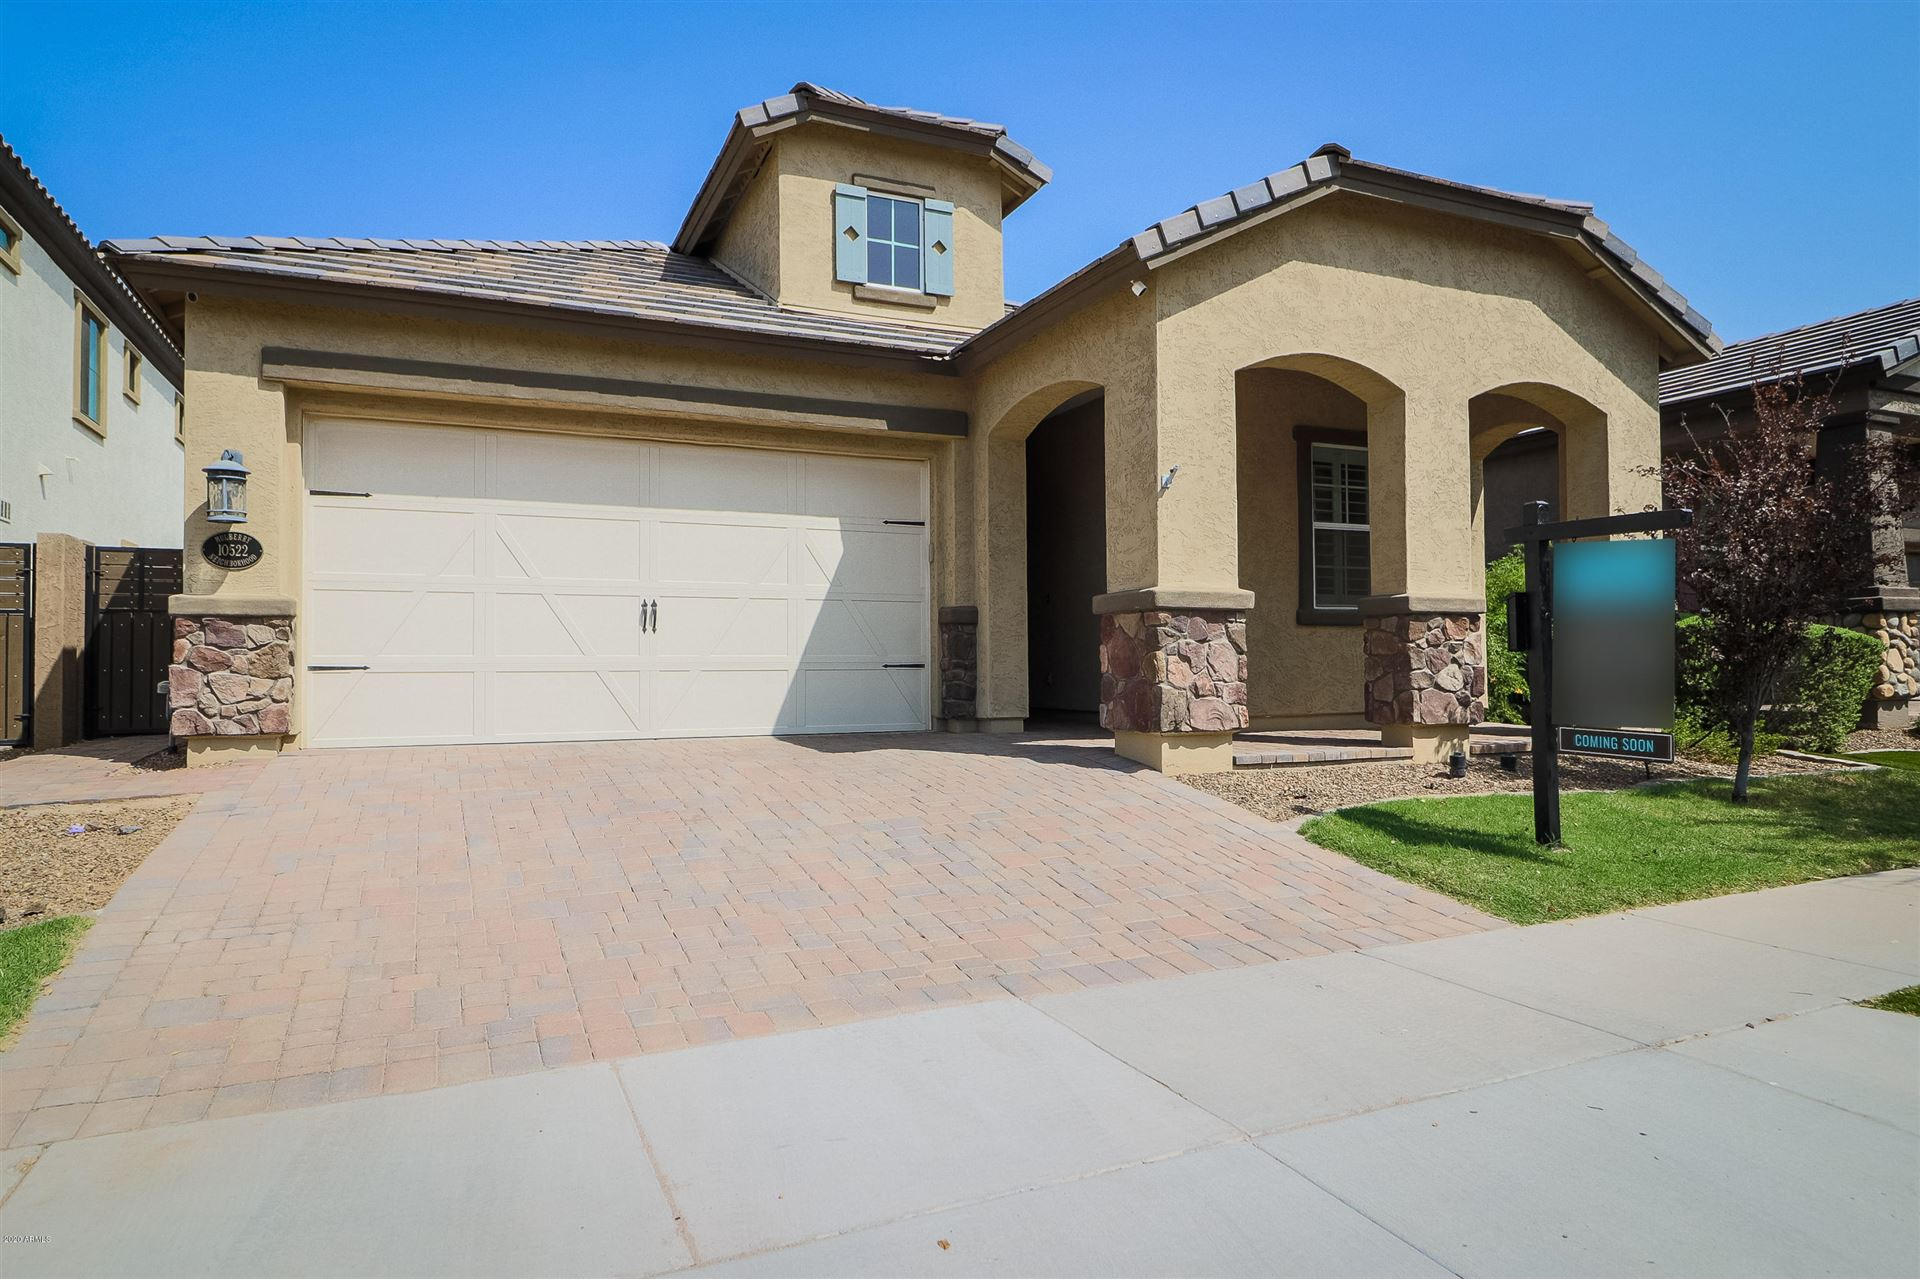 10522 E NARANJA Avenue, Mesa, AZ 85209 - MLS#: 6127942